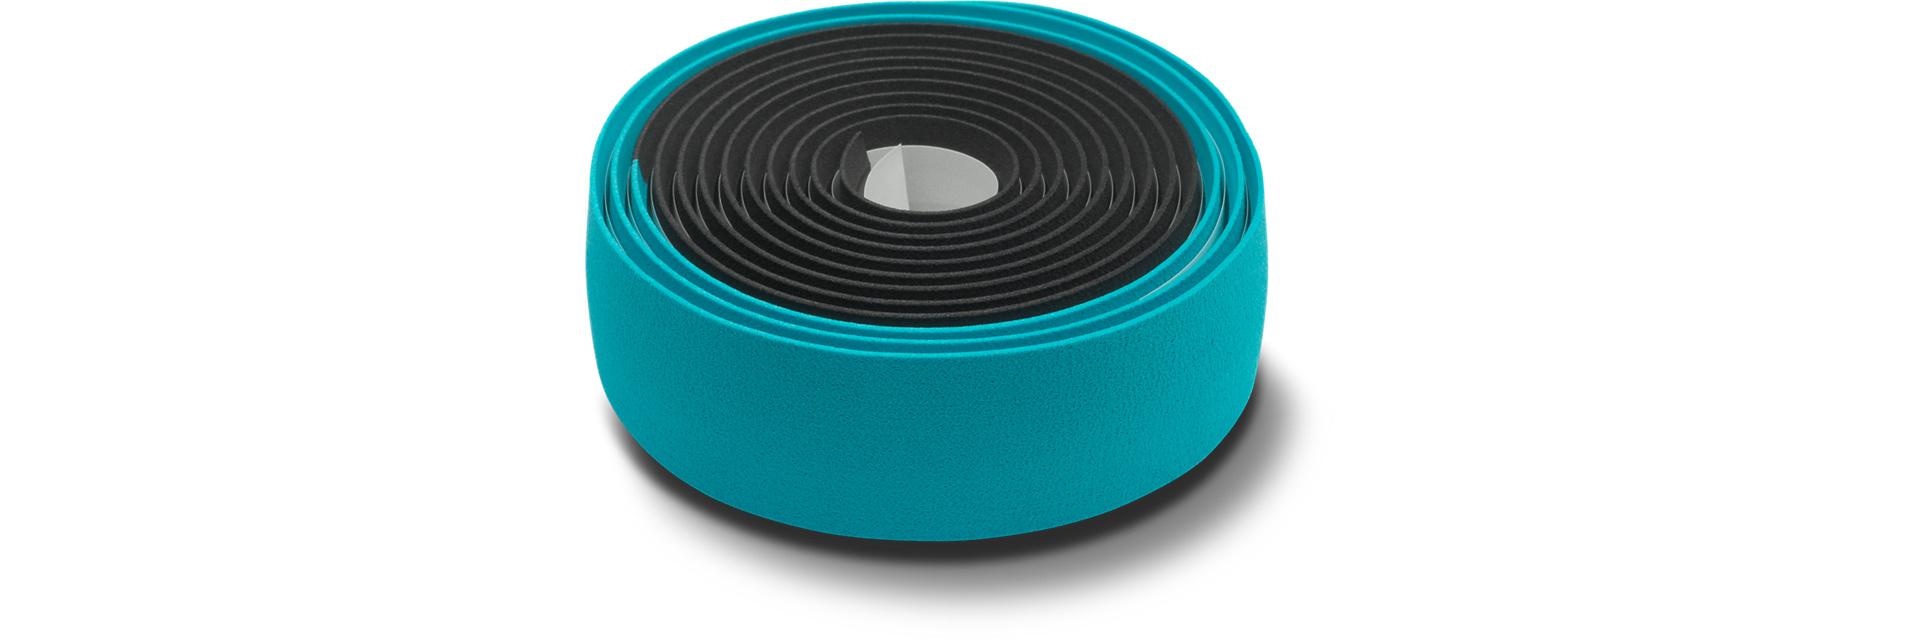 S WRAP ROUBAIX TAPE - Nice Blue/Black